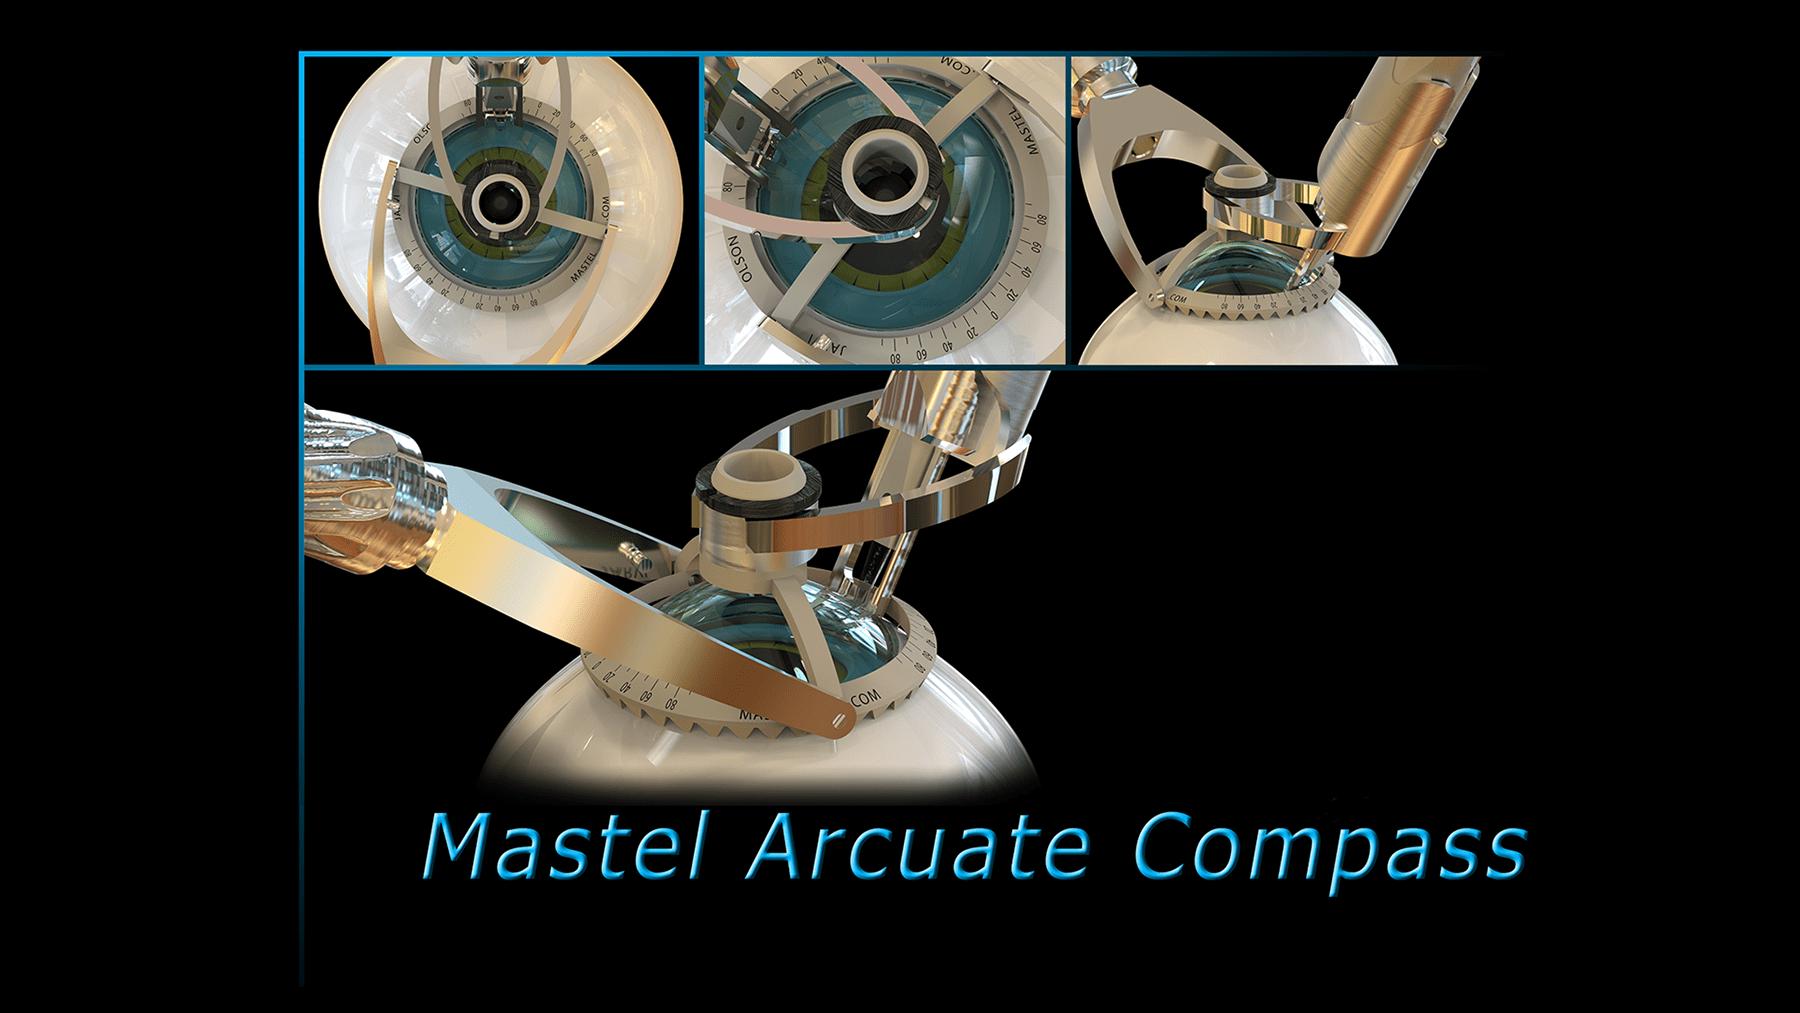 Mastel Arcuate Compass